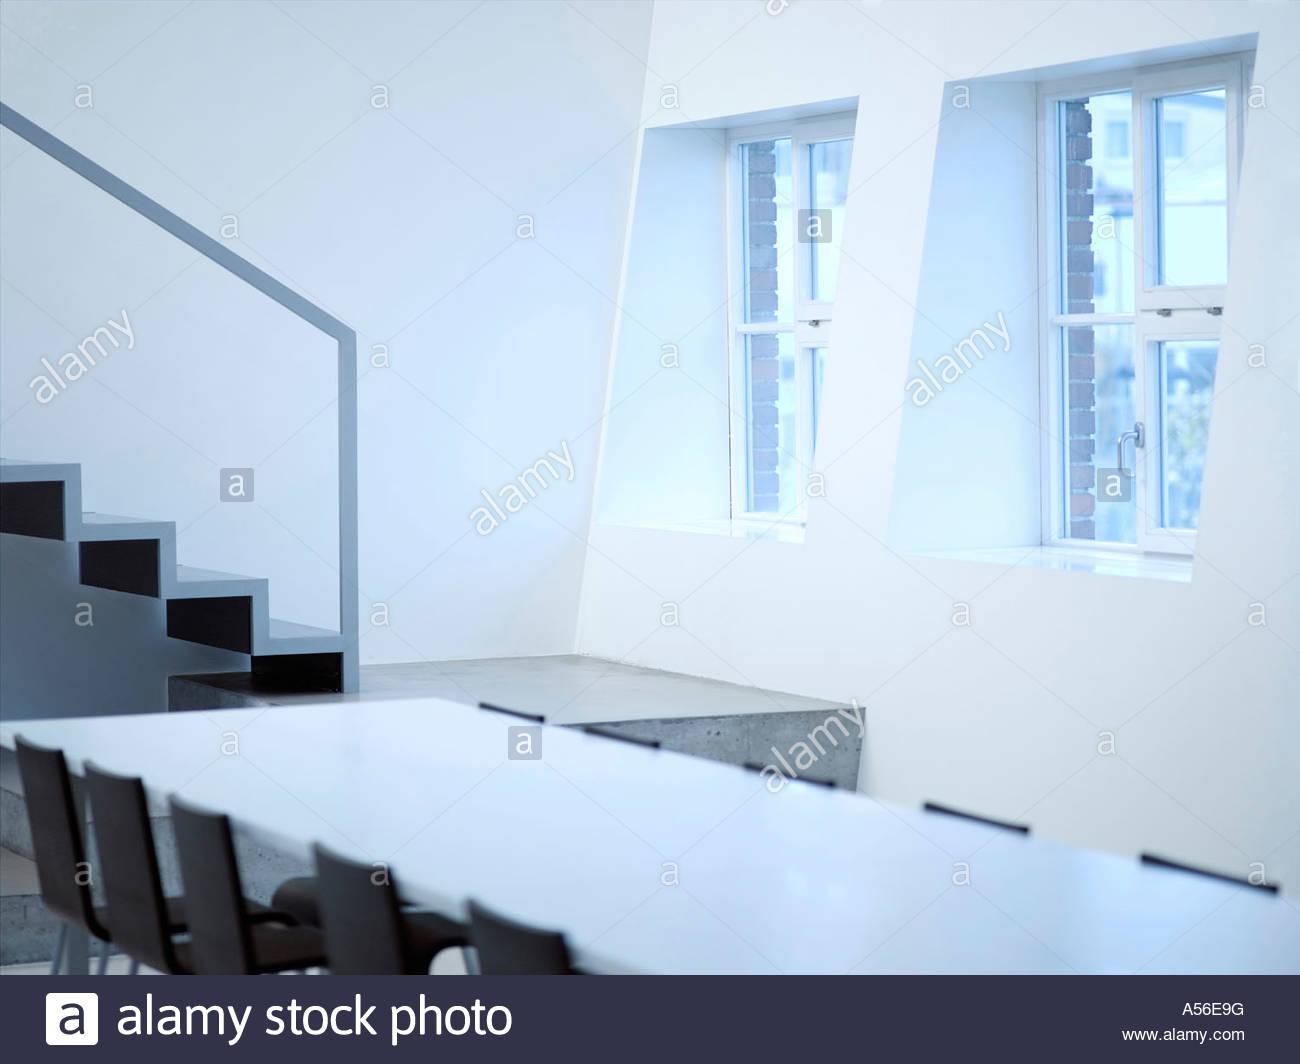 Interior of room - Stock Image